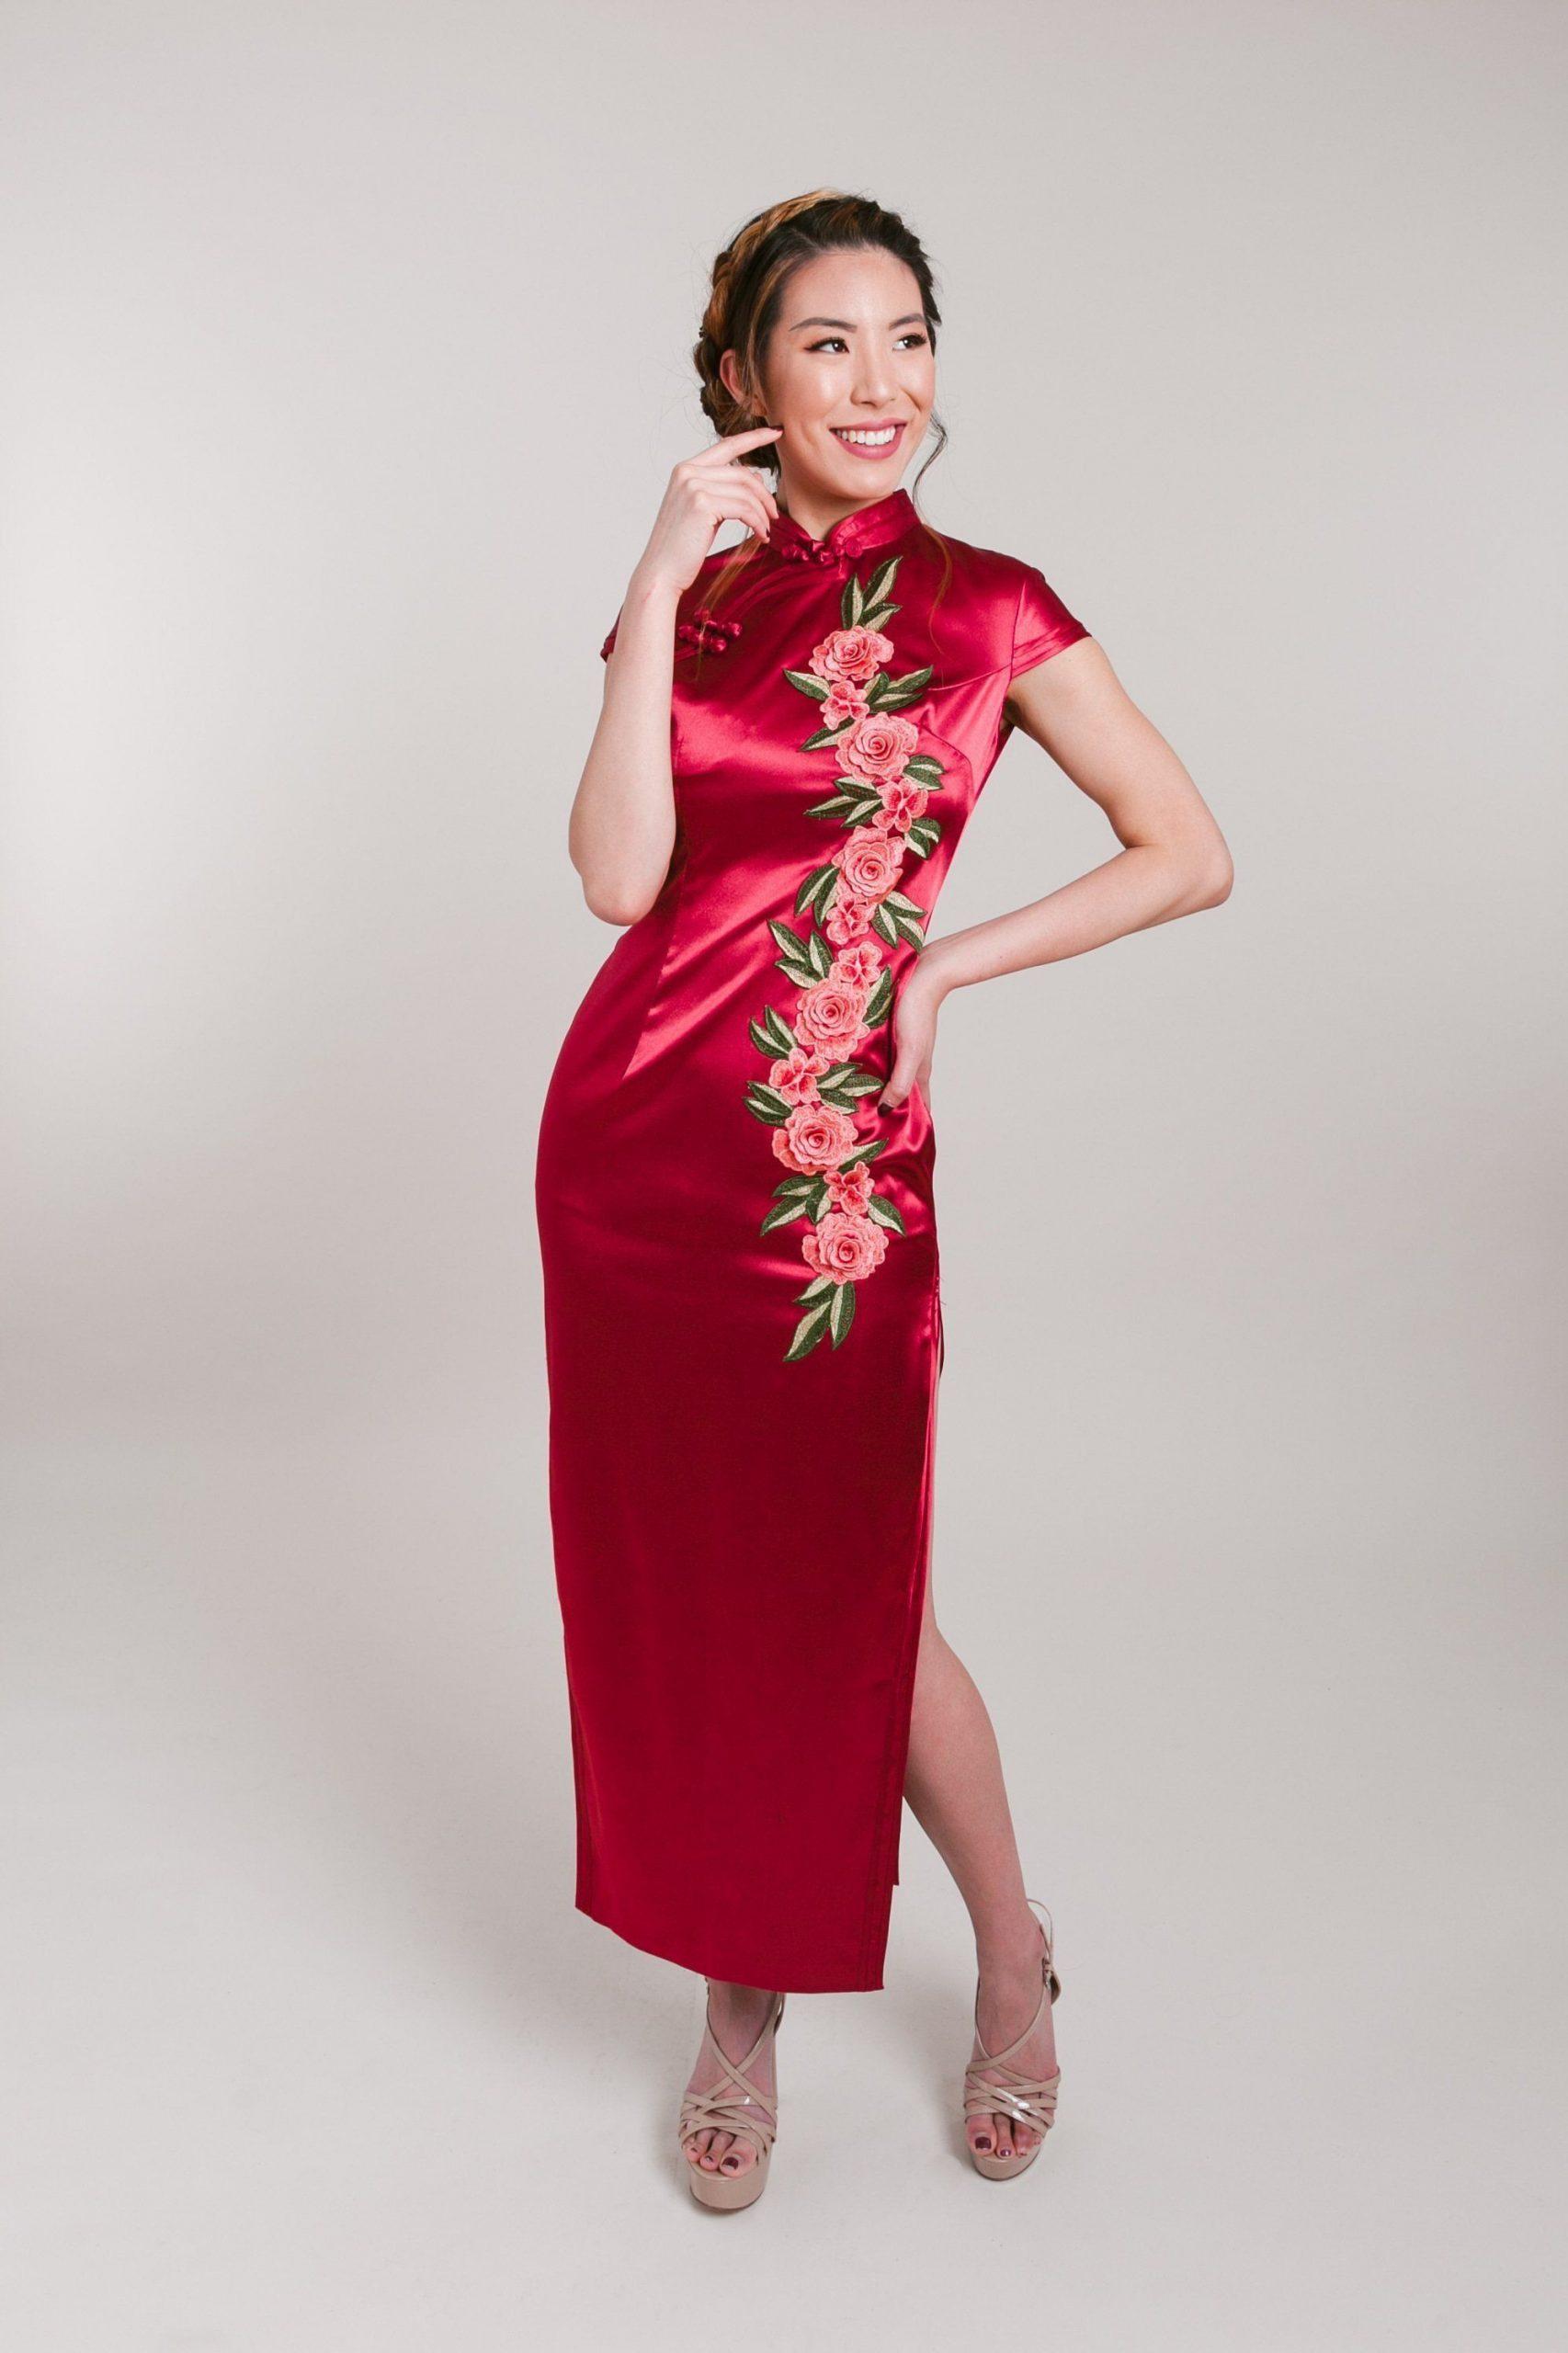 Abend Einzigartig Qipao Abendkleid Boutique Genial Qipao Abendkleid Design